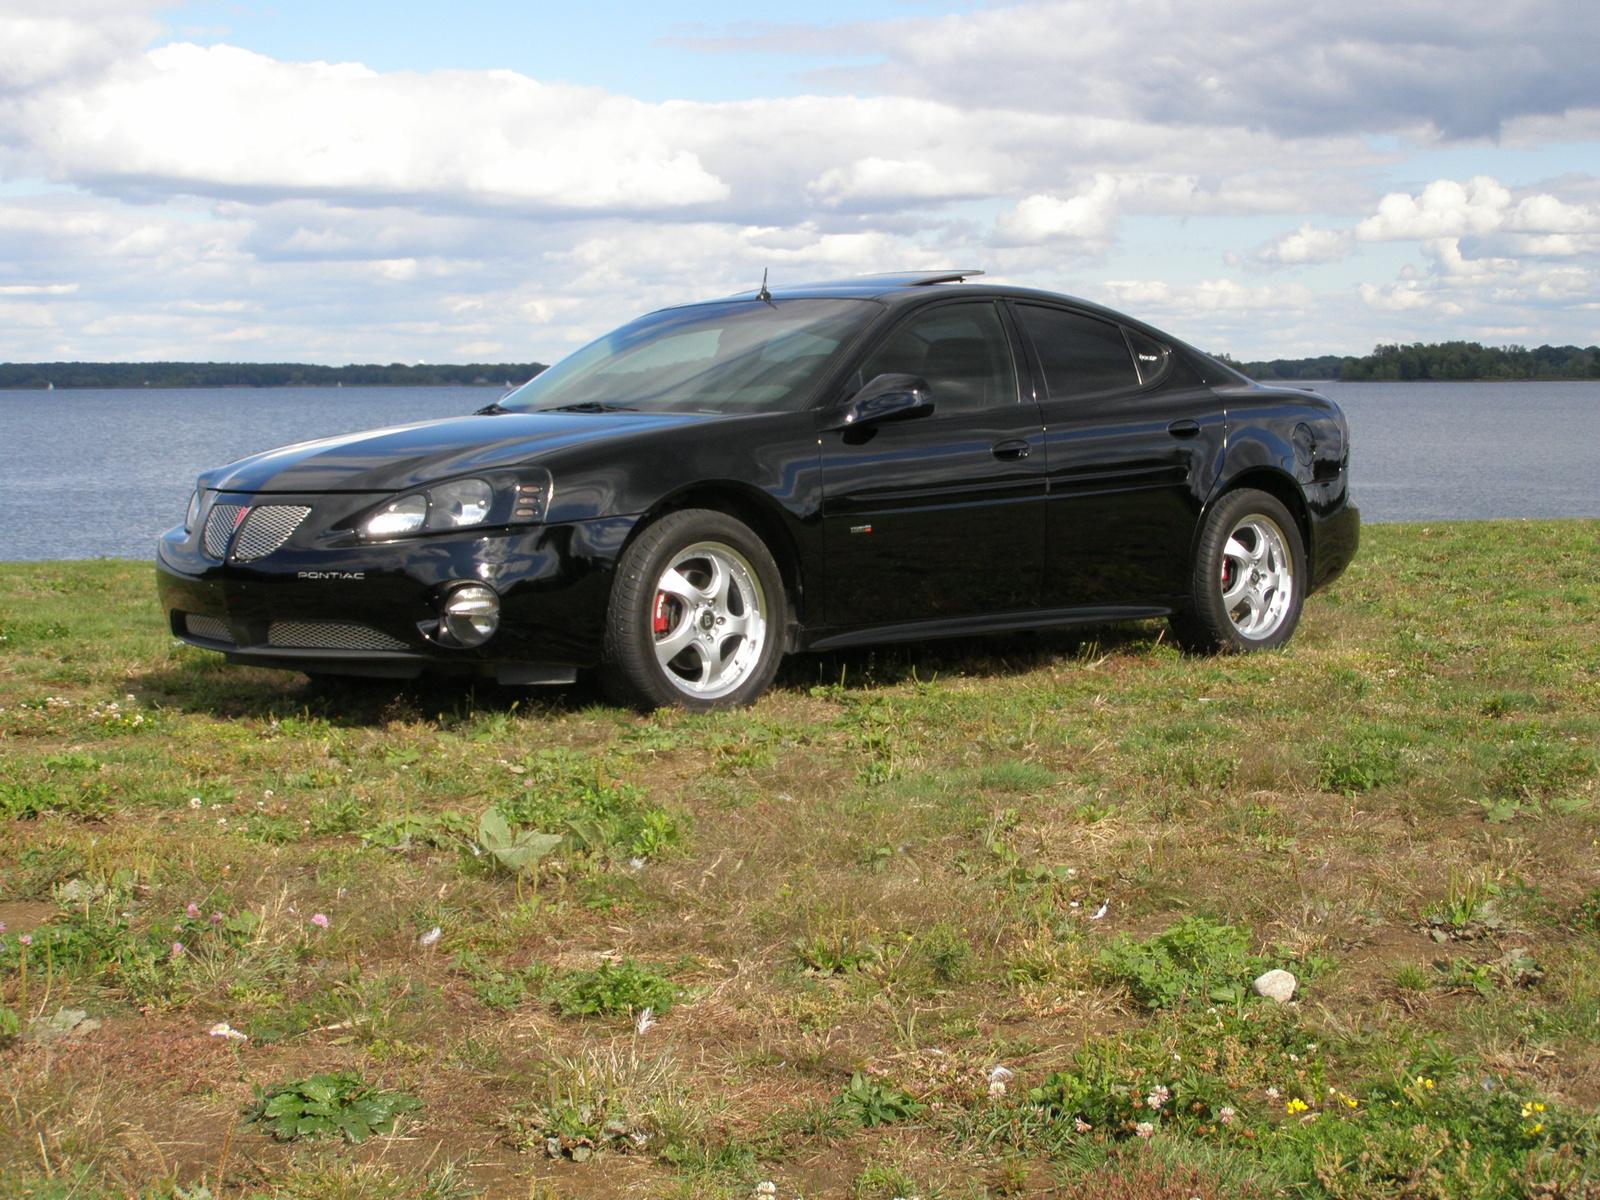 Used Pontiac Aztek For Sale Cargurus Autos Post